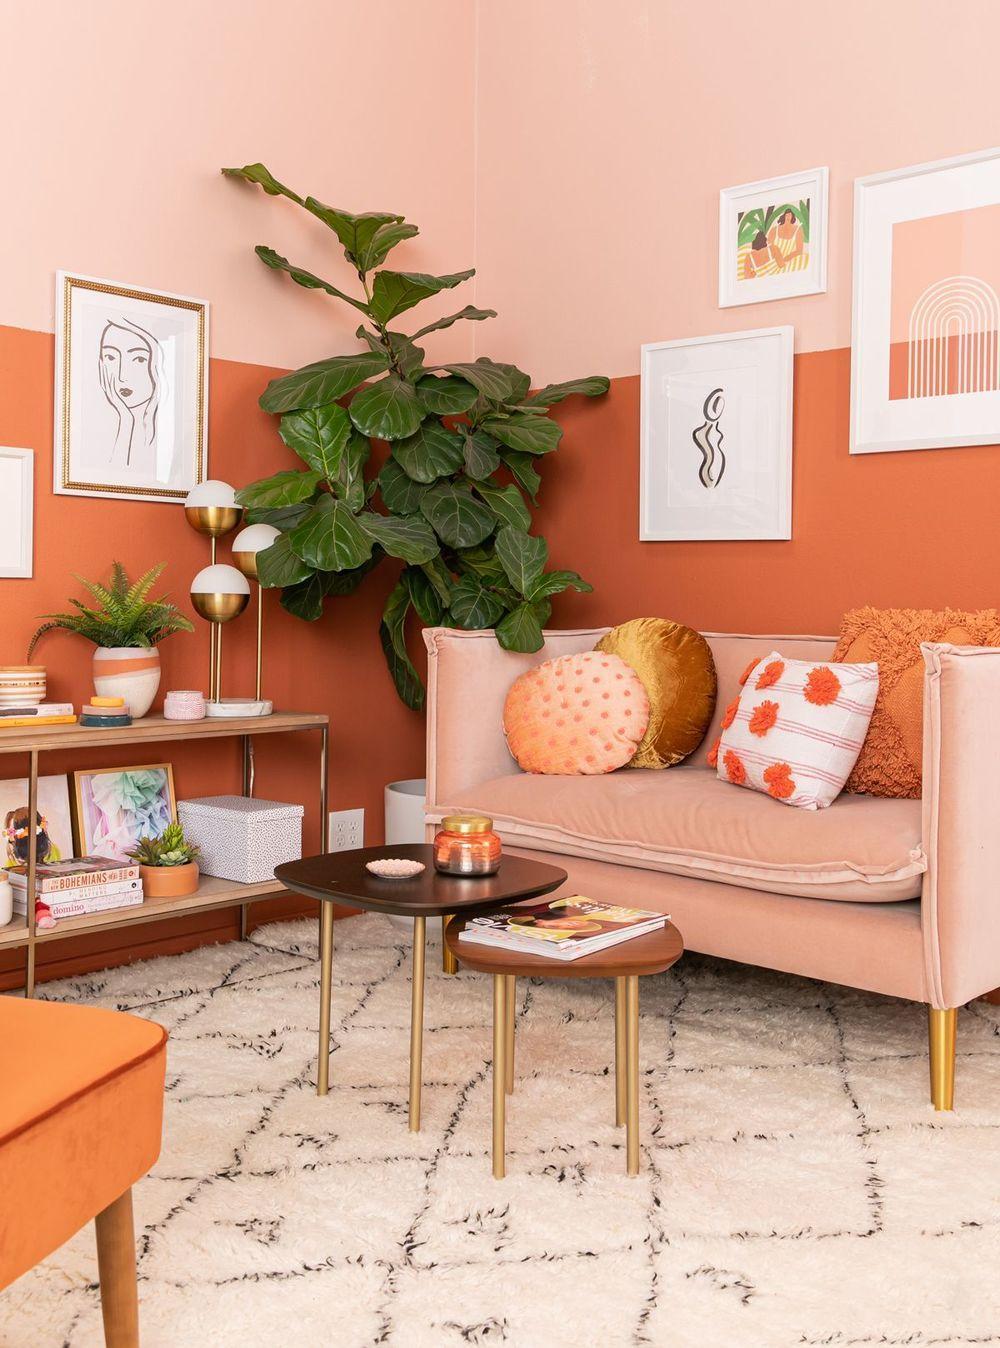 Inviter le printemps dans son salon marocain moderne